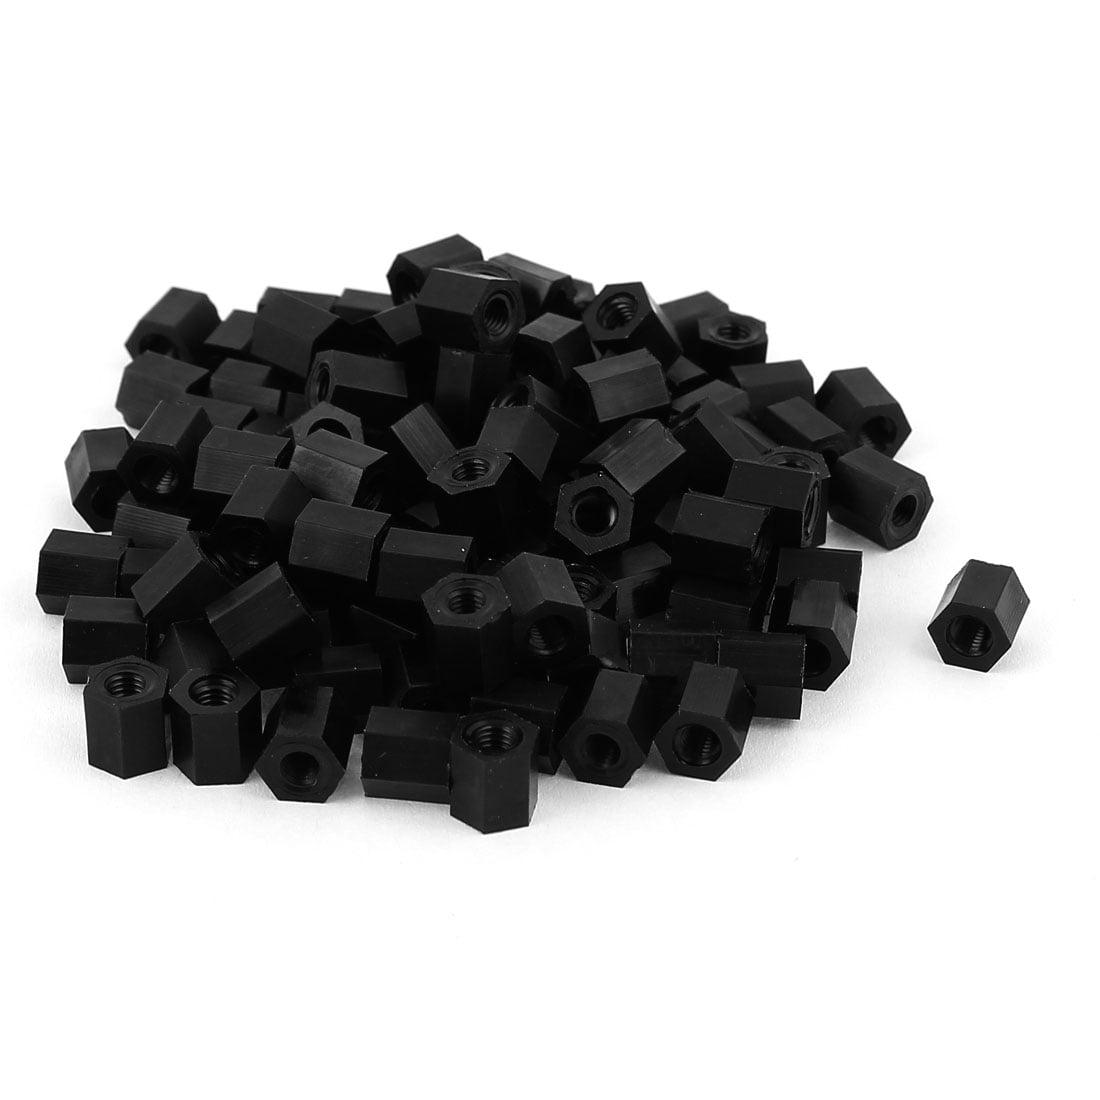 100 PCS M3x6mm Black Nylon Screw.